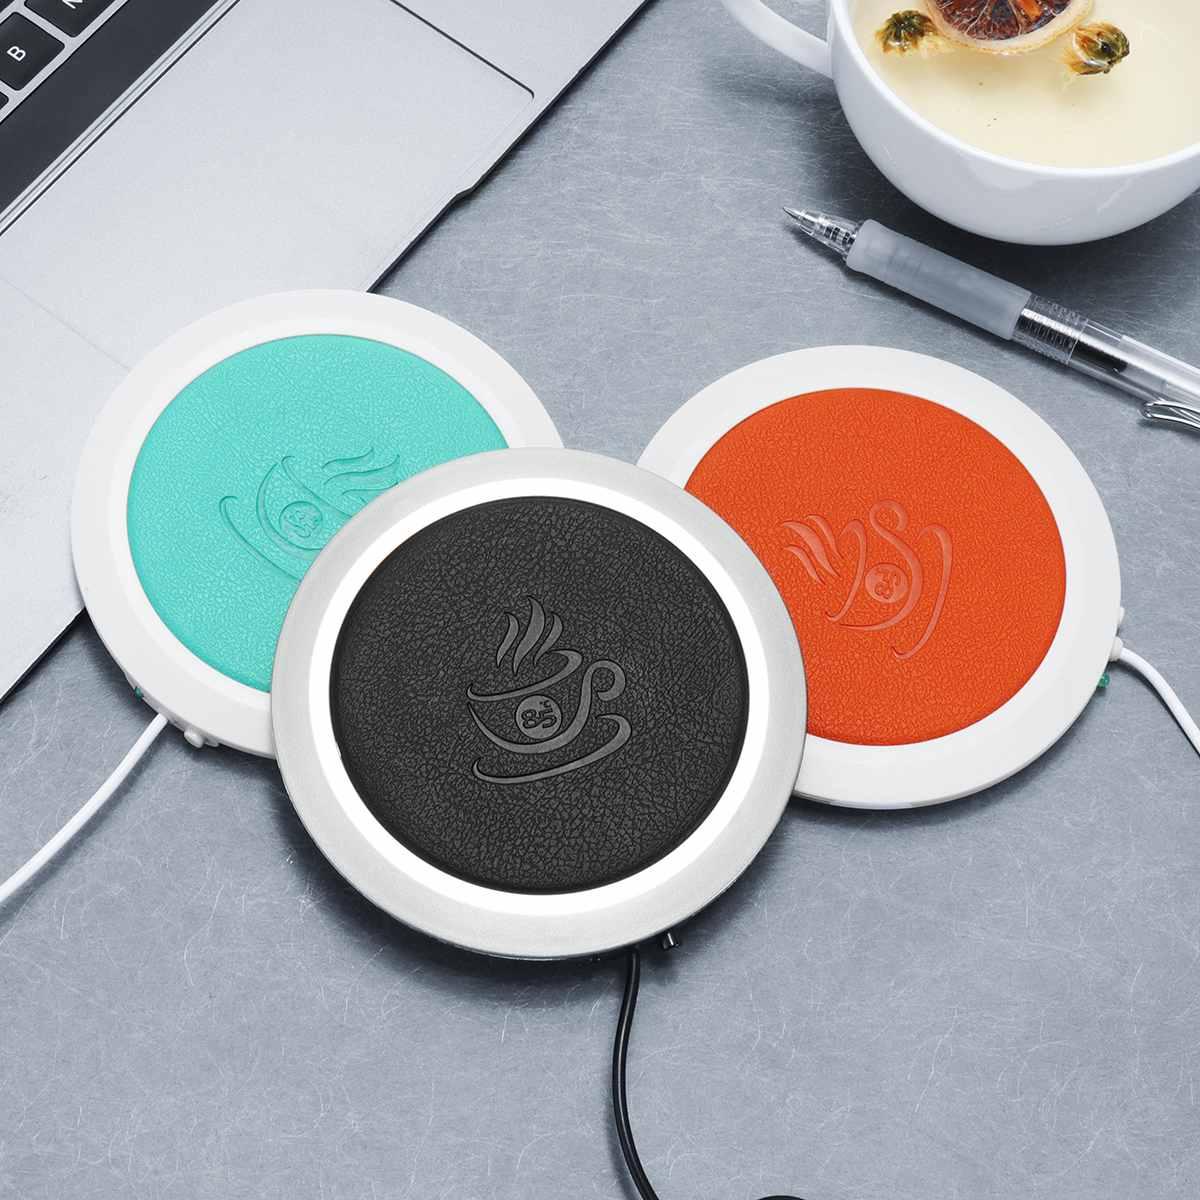 Warmtoo USB Insulation Heater Heat Insulation Electric Multifunction Coffee Cup Mug Mat Pad Home Useful Accessories